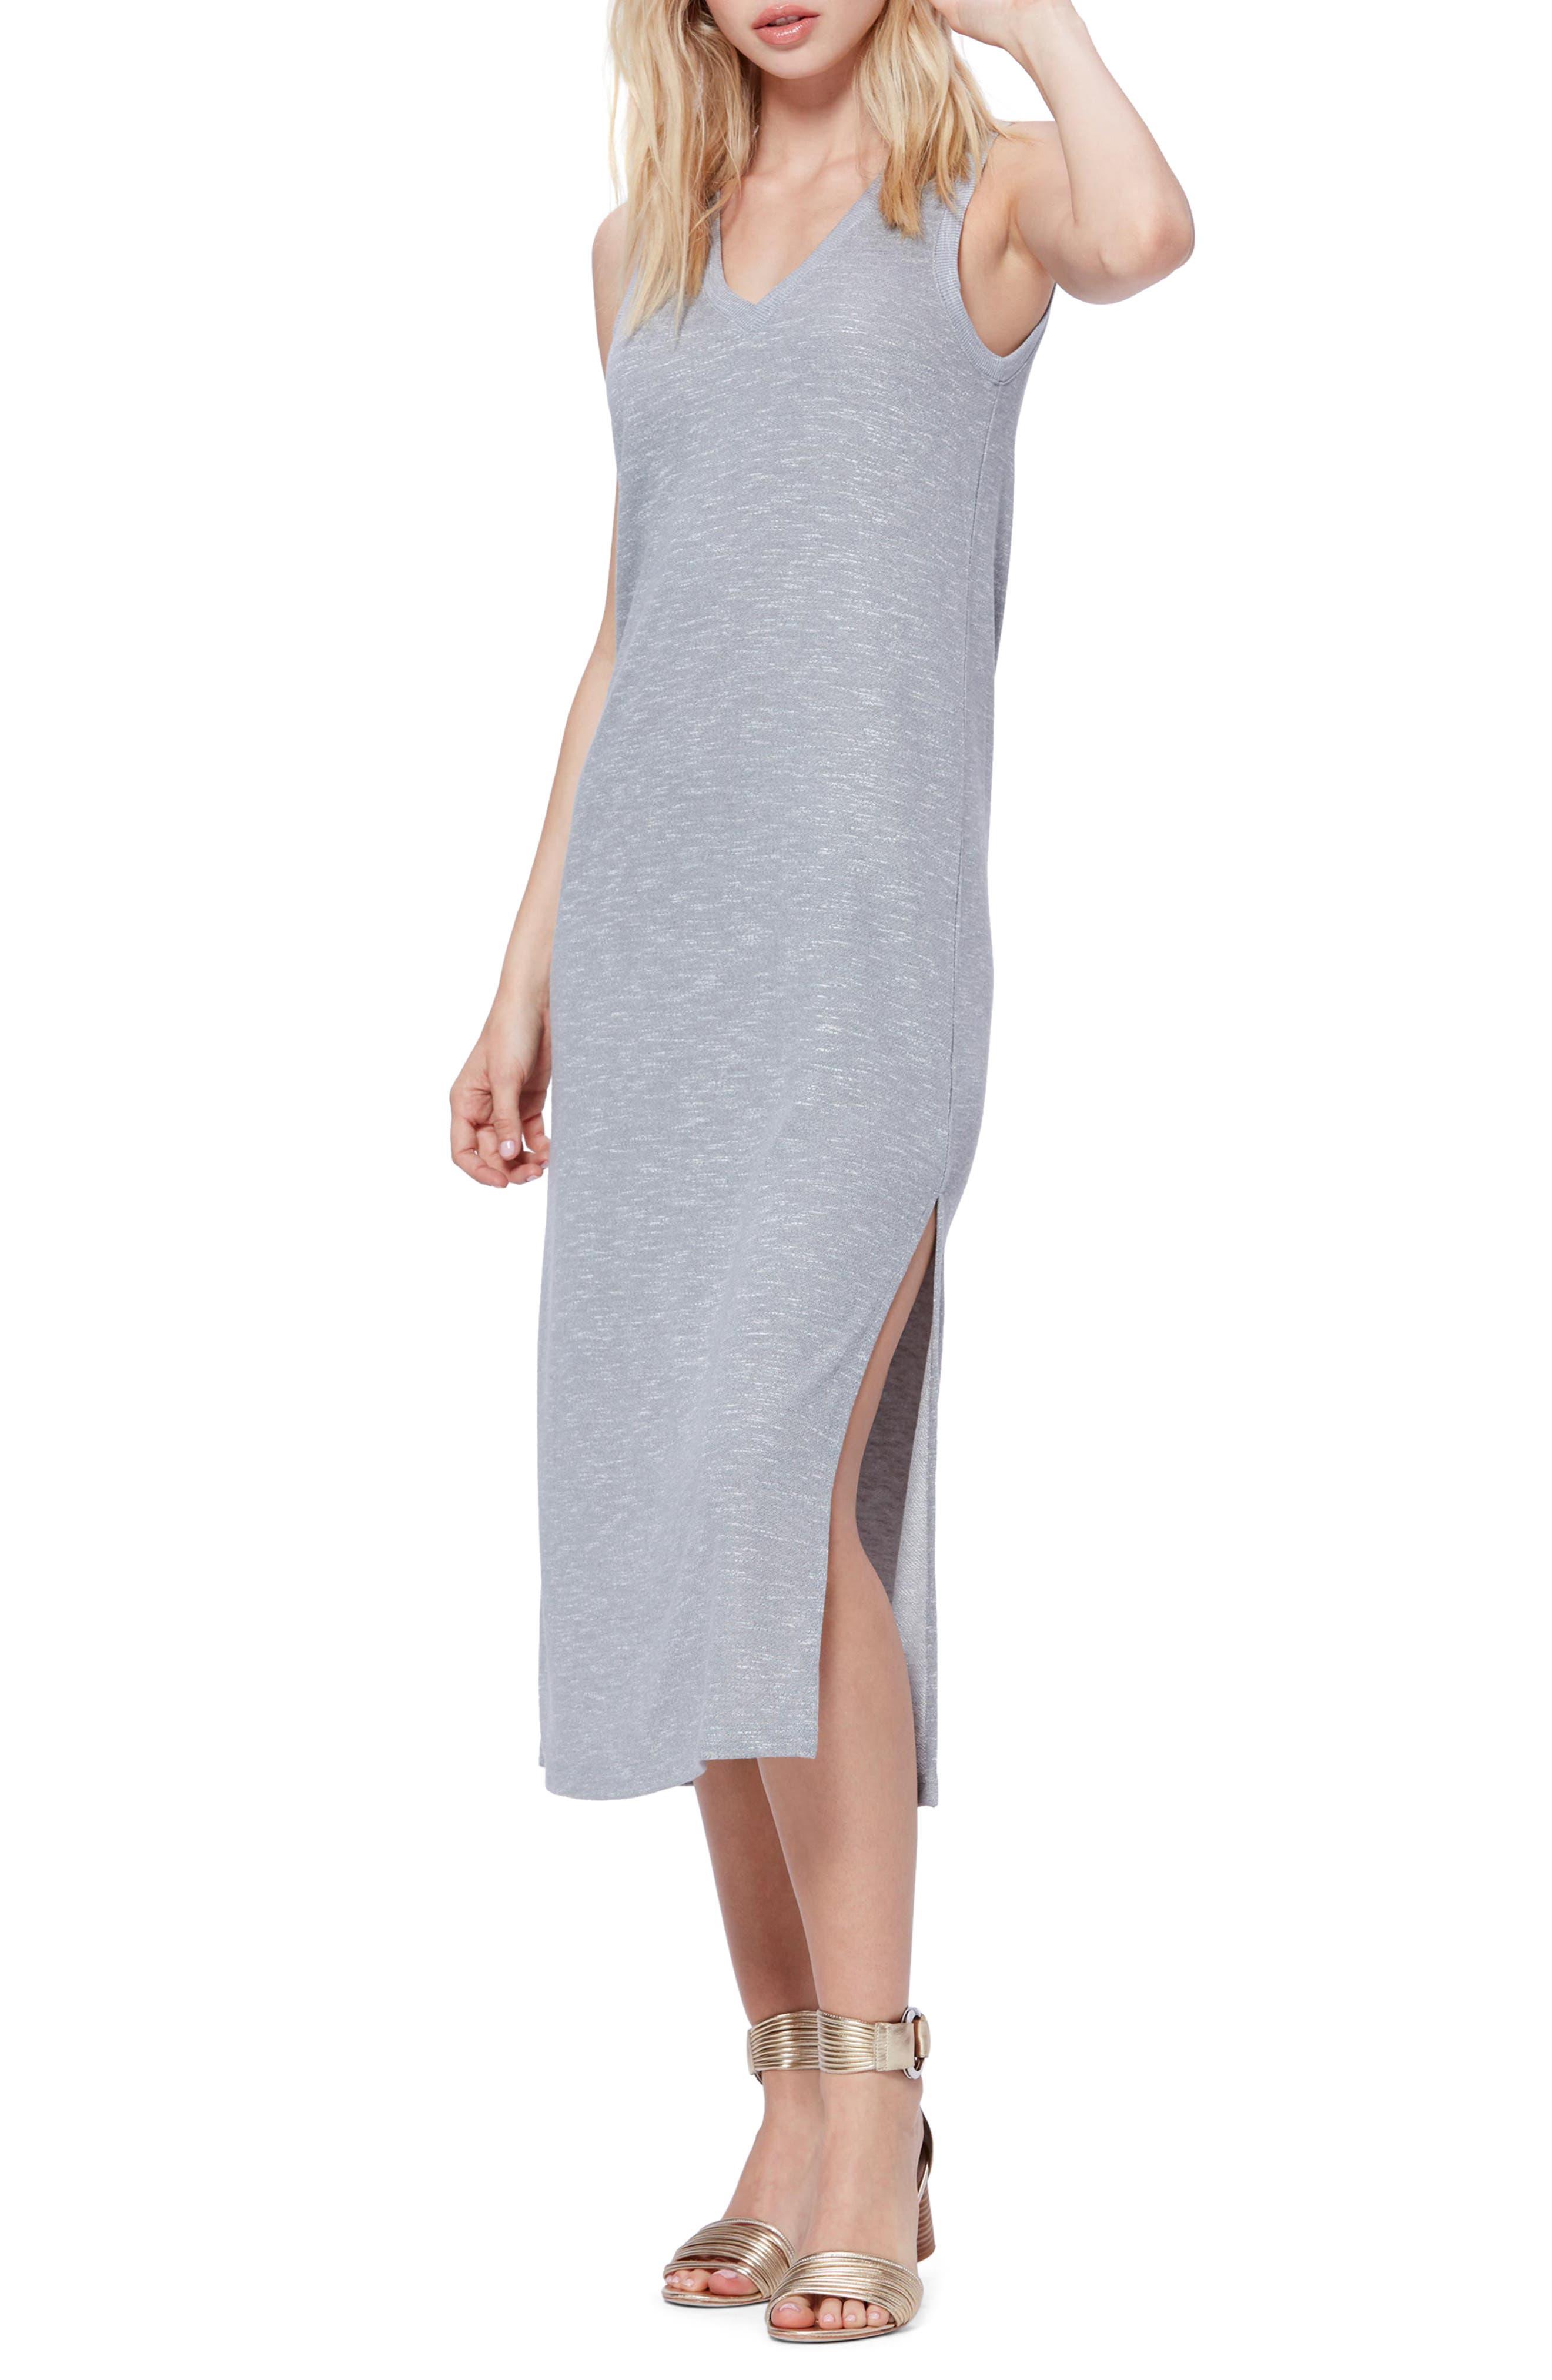 Paige Sage Midi Tank Dress, Grey